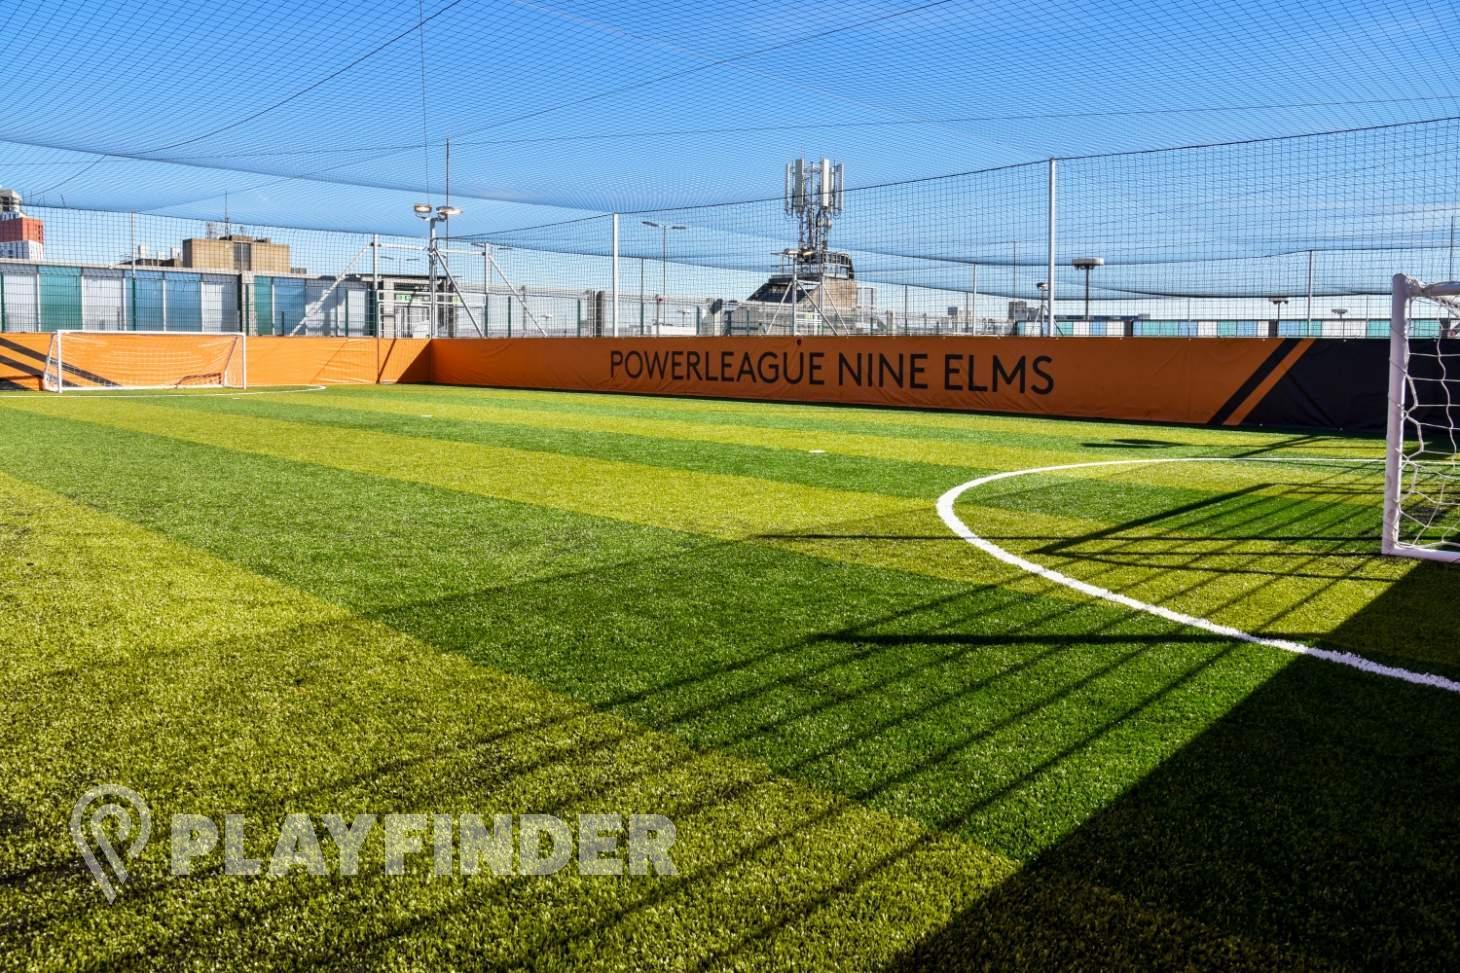 Powerleague Nine Elms 5 a side | 3G Astroturf football pitch